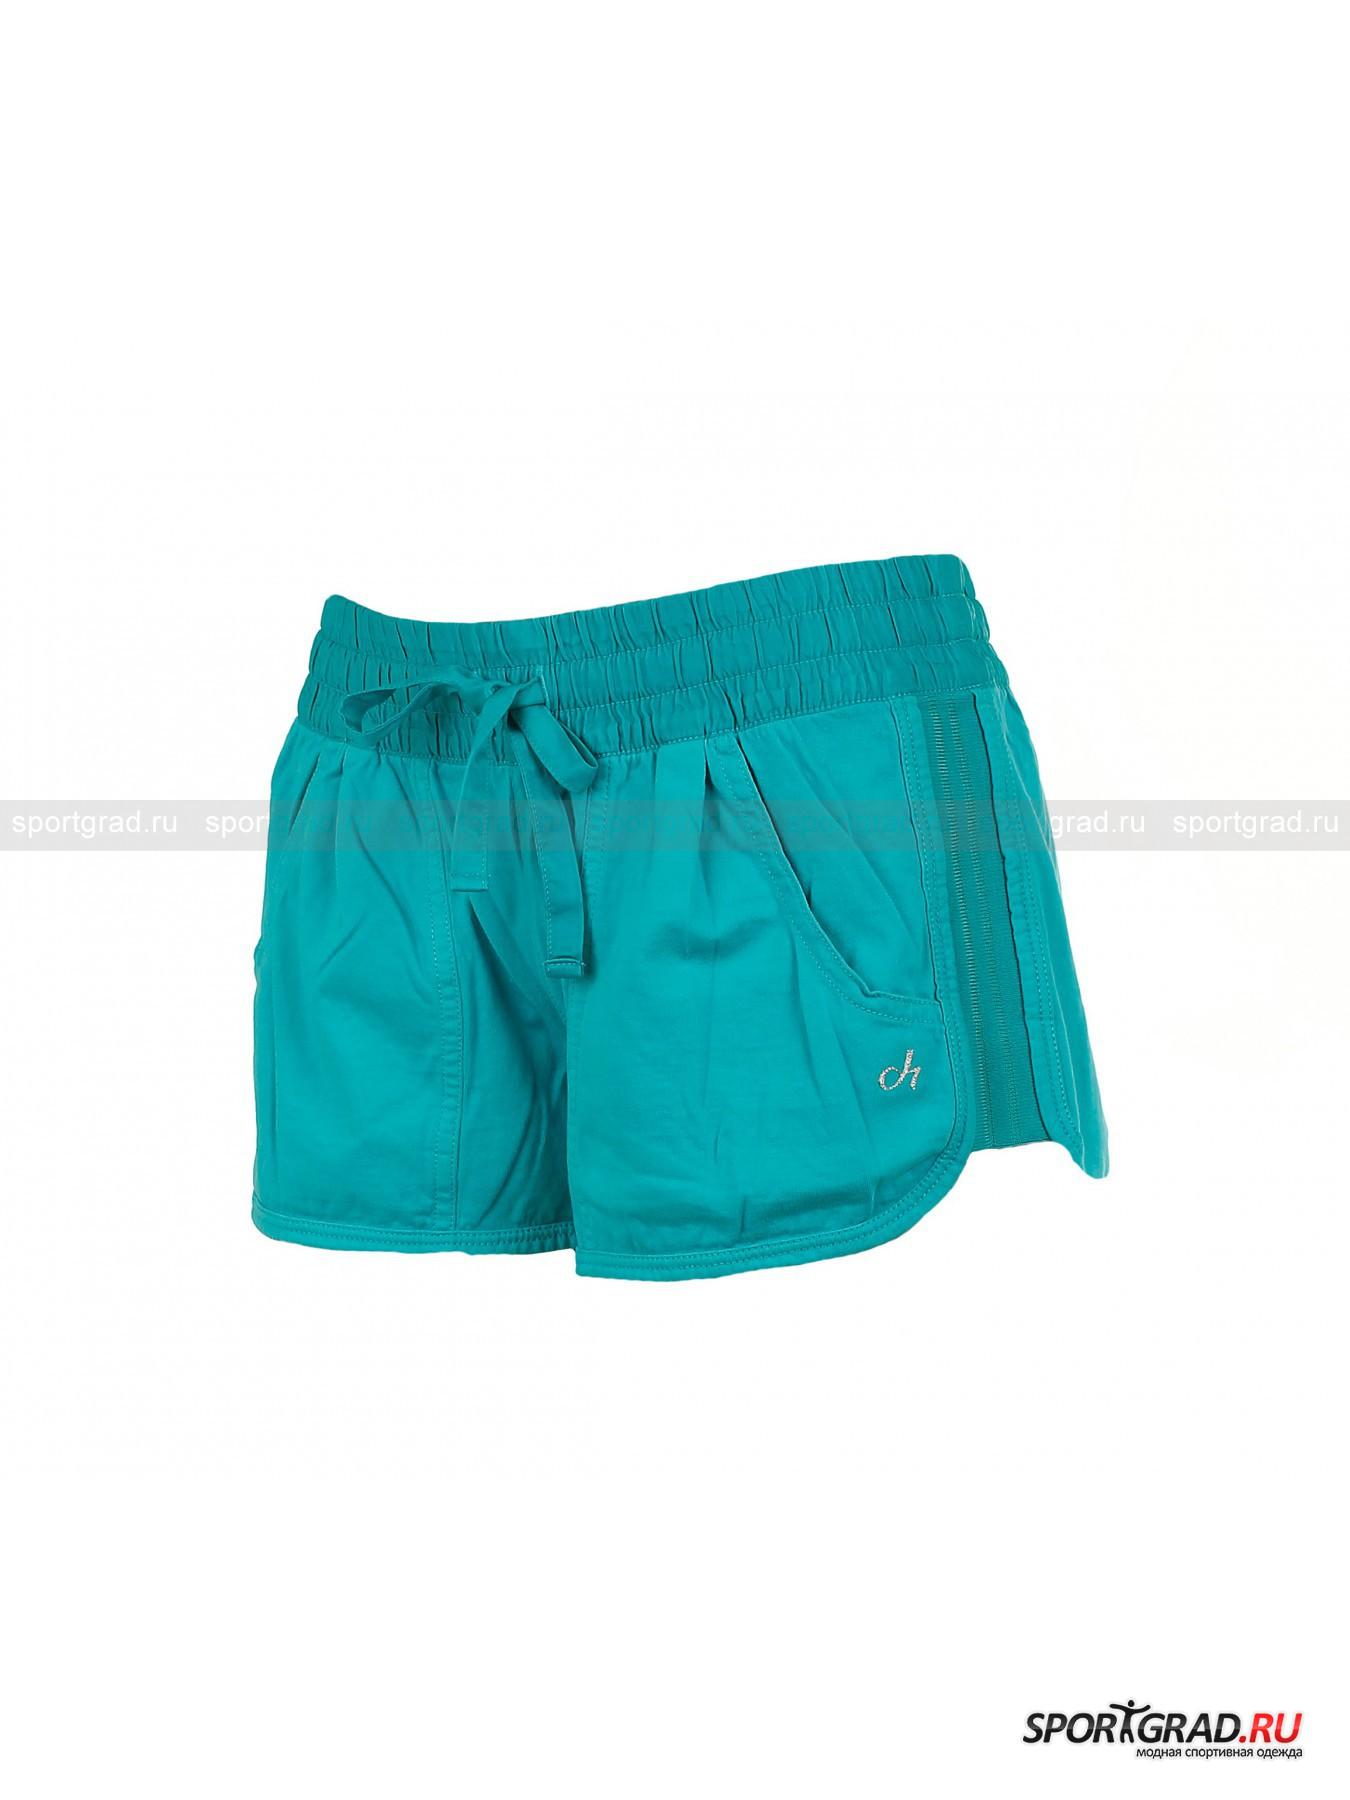 Шорты Shorts DEHA от Спортград